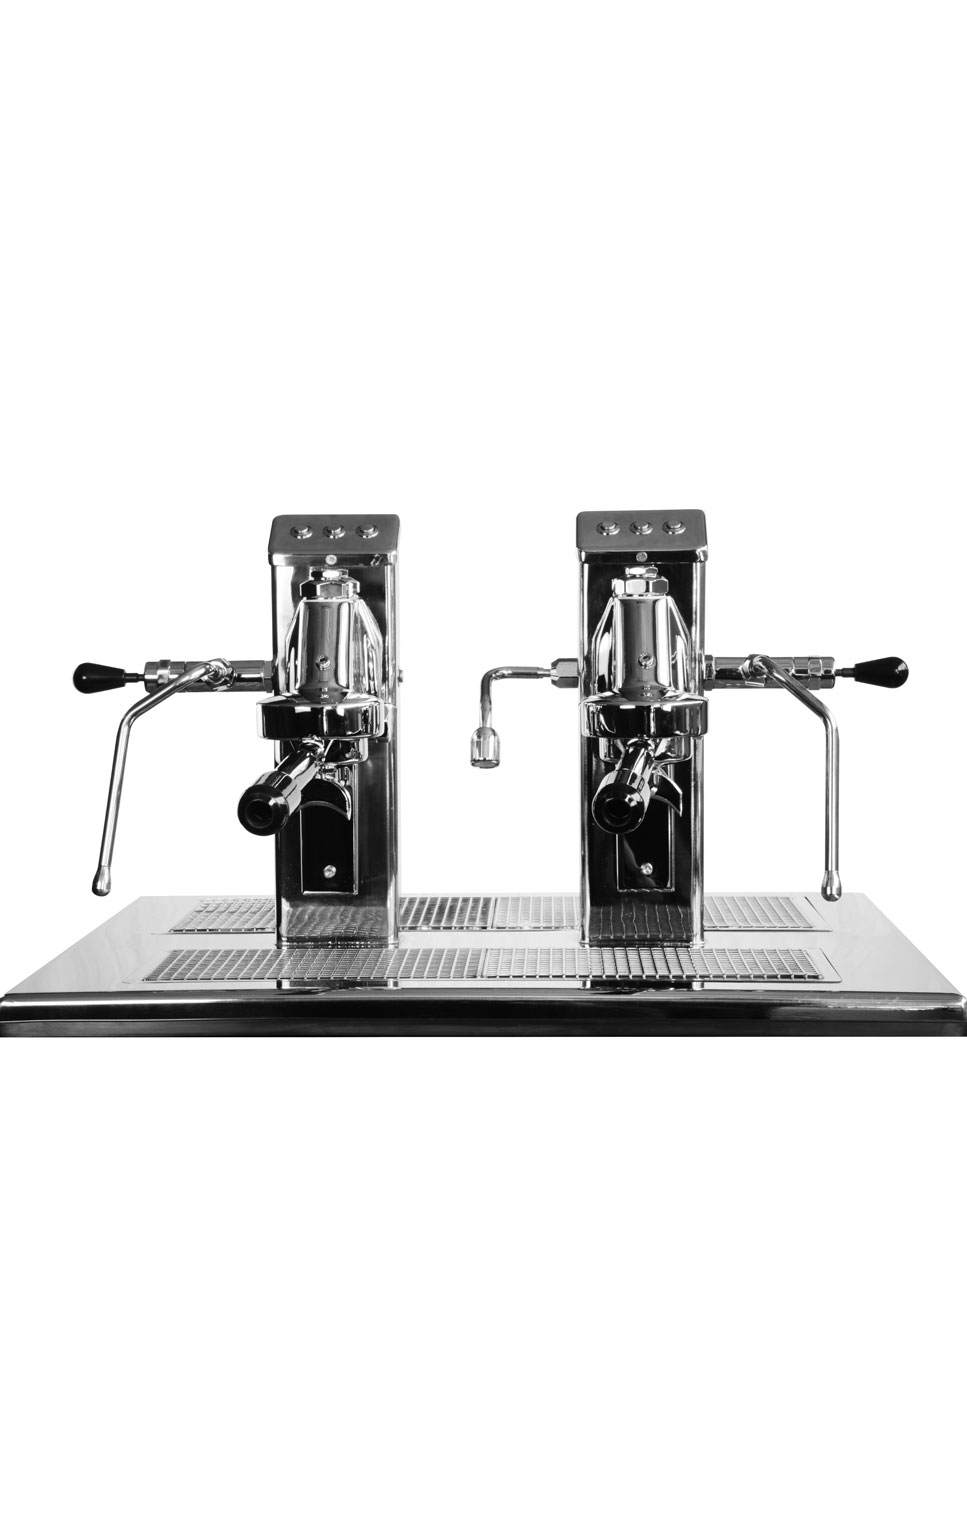 Commercial Espresso Coffee Machine espressoDECK 2 group front